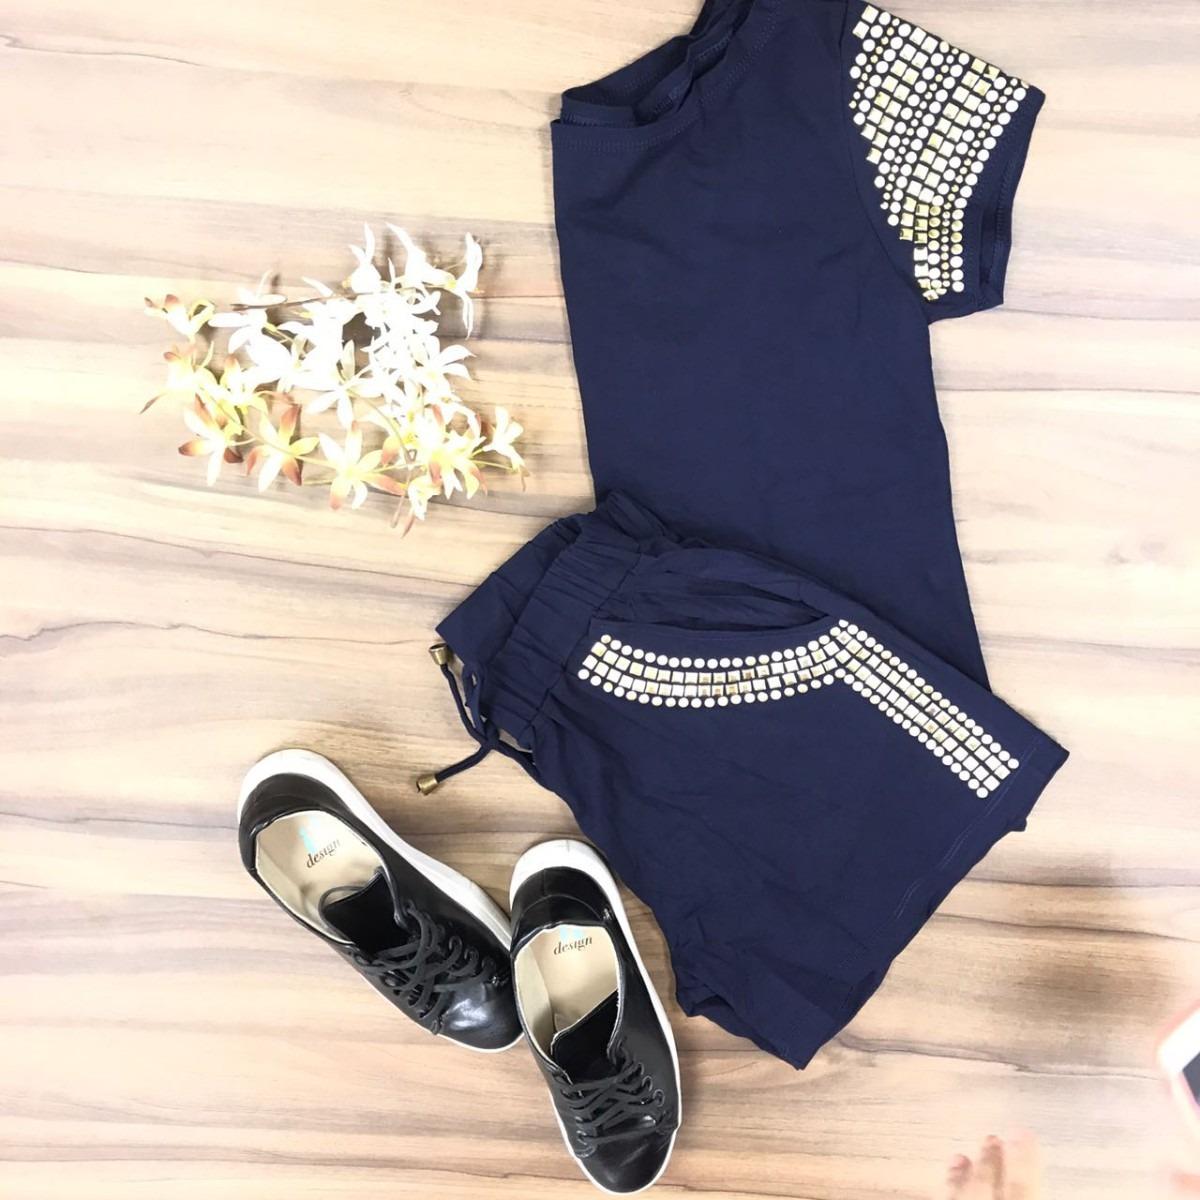 79696b5b07 conjunto pedraria shorts + blusa roupas da moda feminina top. Carregando  zoom.